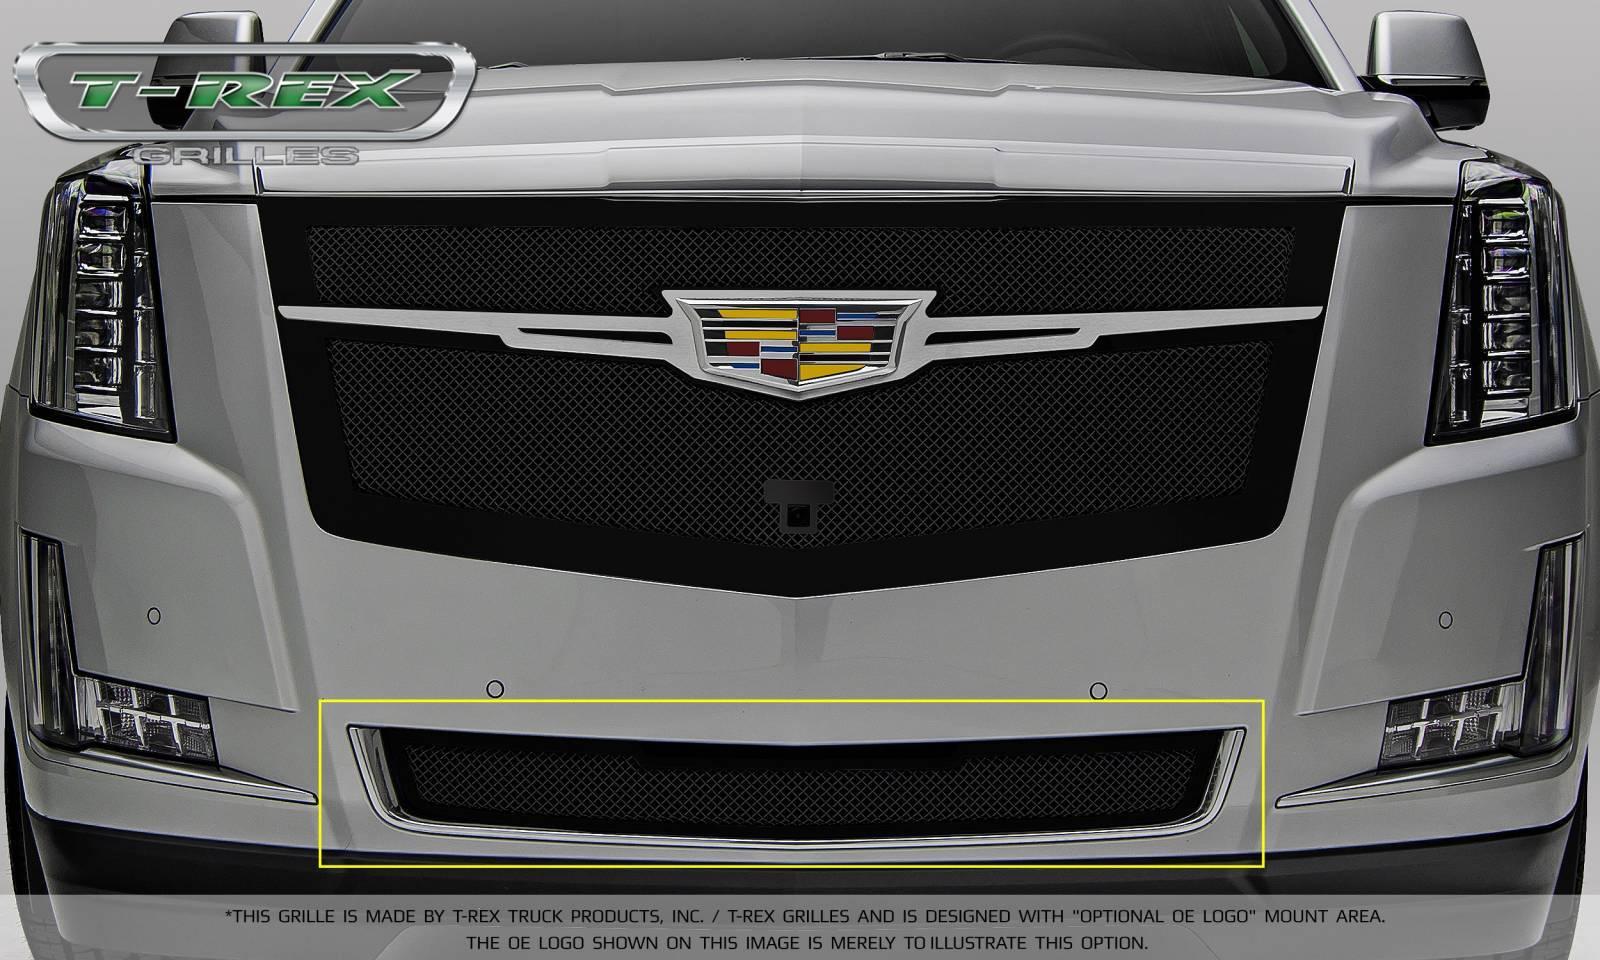 Cadillac Escalade Upper Class Bumper Grille Overlay - Black - Pt # 52181